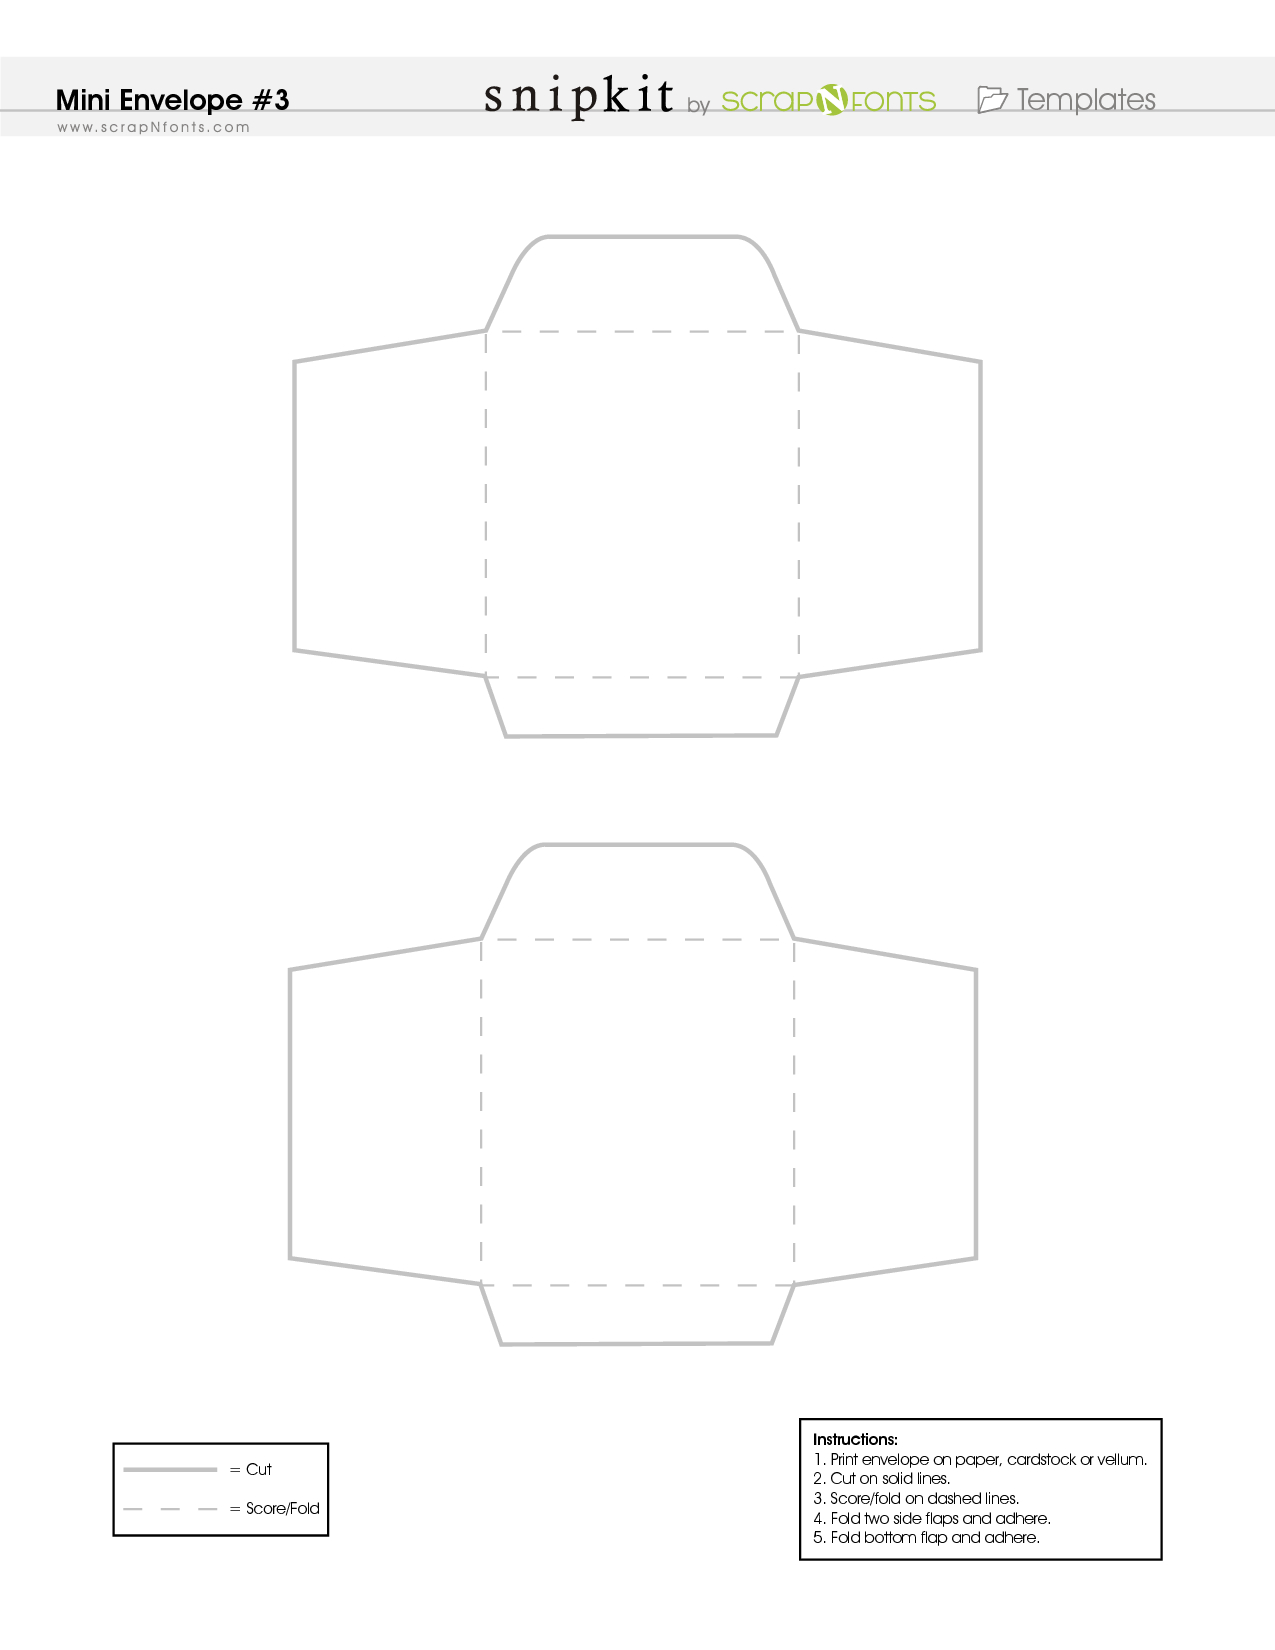 Free Printable Mini Envelope Template - Pdf | Scrapbooking - Mini - Free Printable Greeting Card Envelope Template